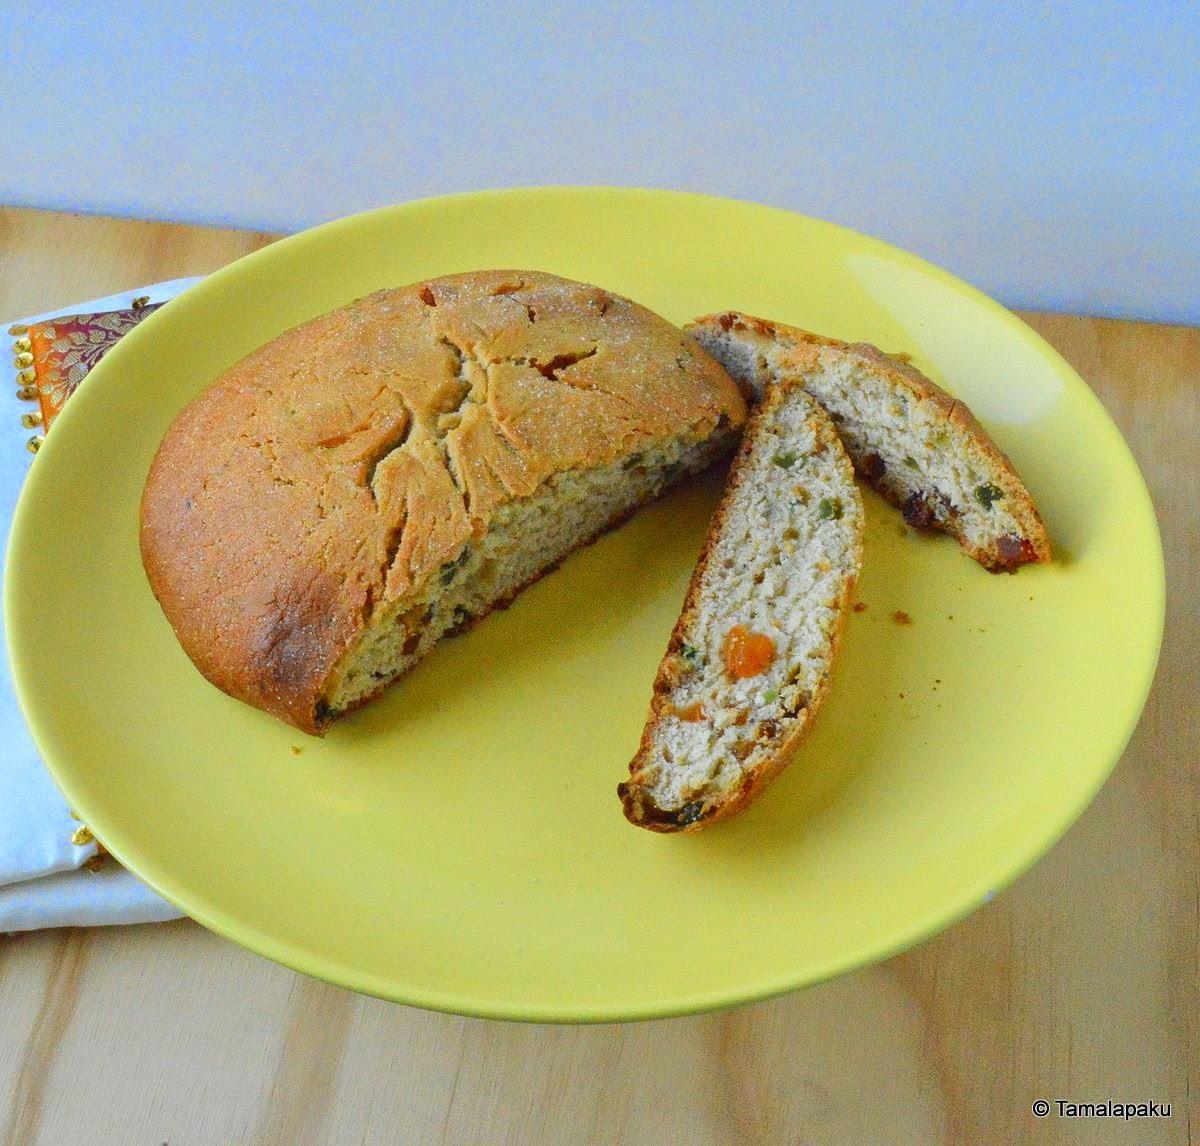 Julekake Norwegian Christmas Bread Recipe  Julekake Eggless Norwegian Christmas Bread Tamalapaku